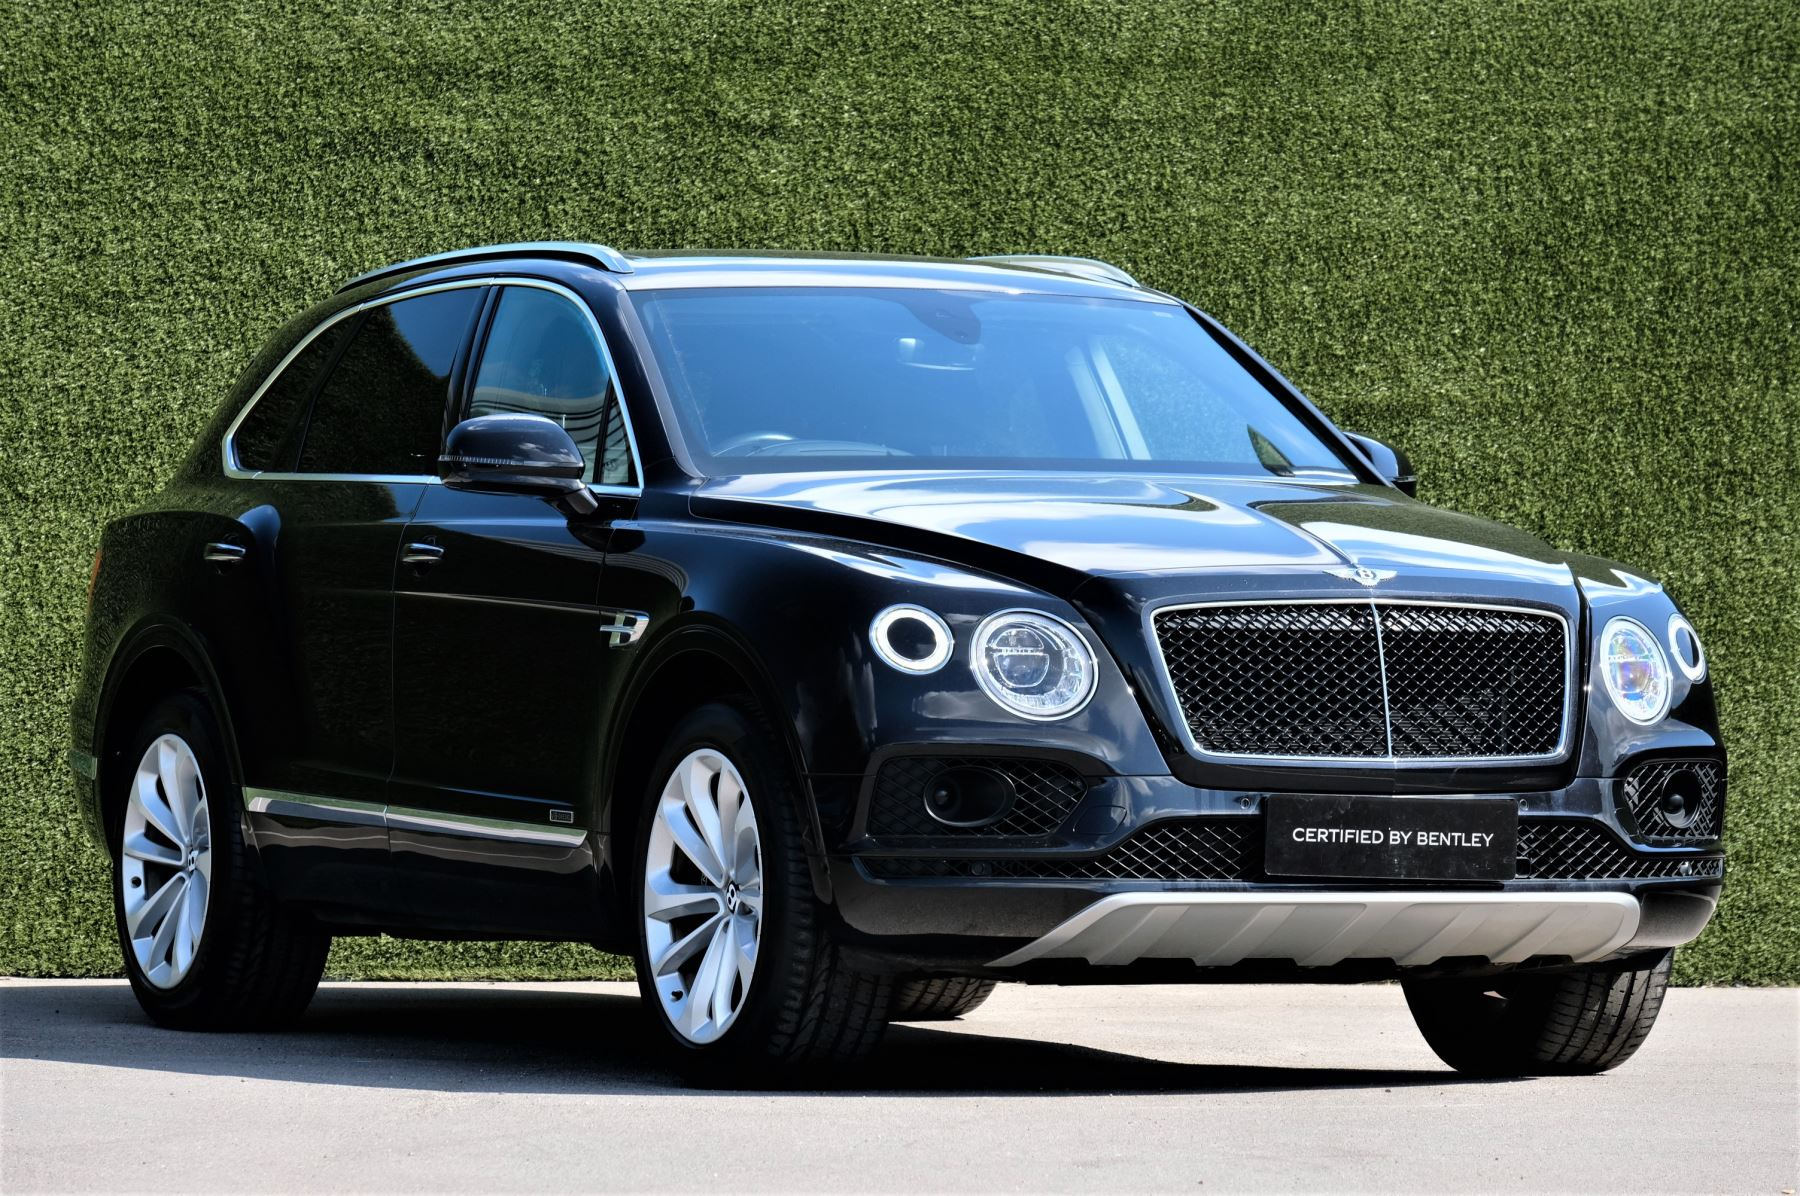 Bentley Bentayga 4.0 V8 5dr image 1